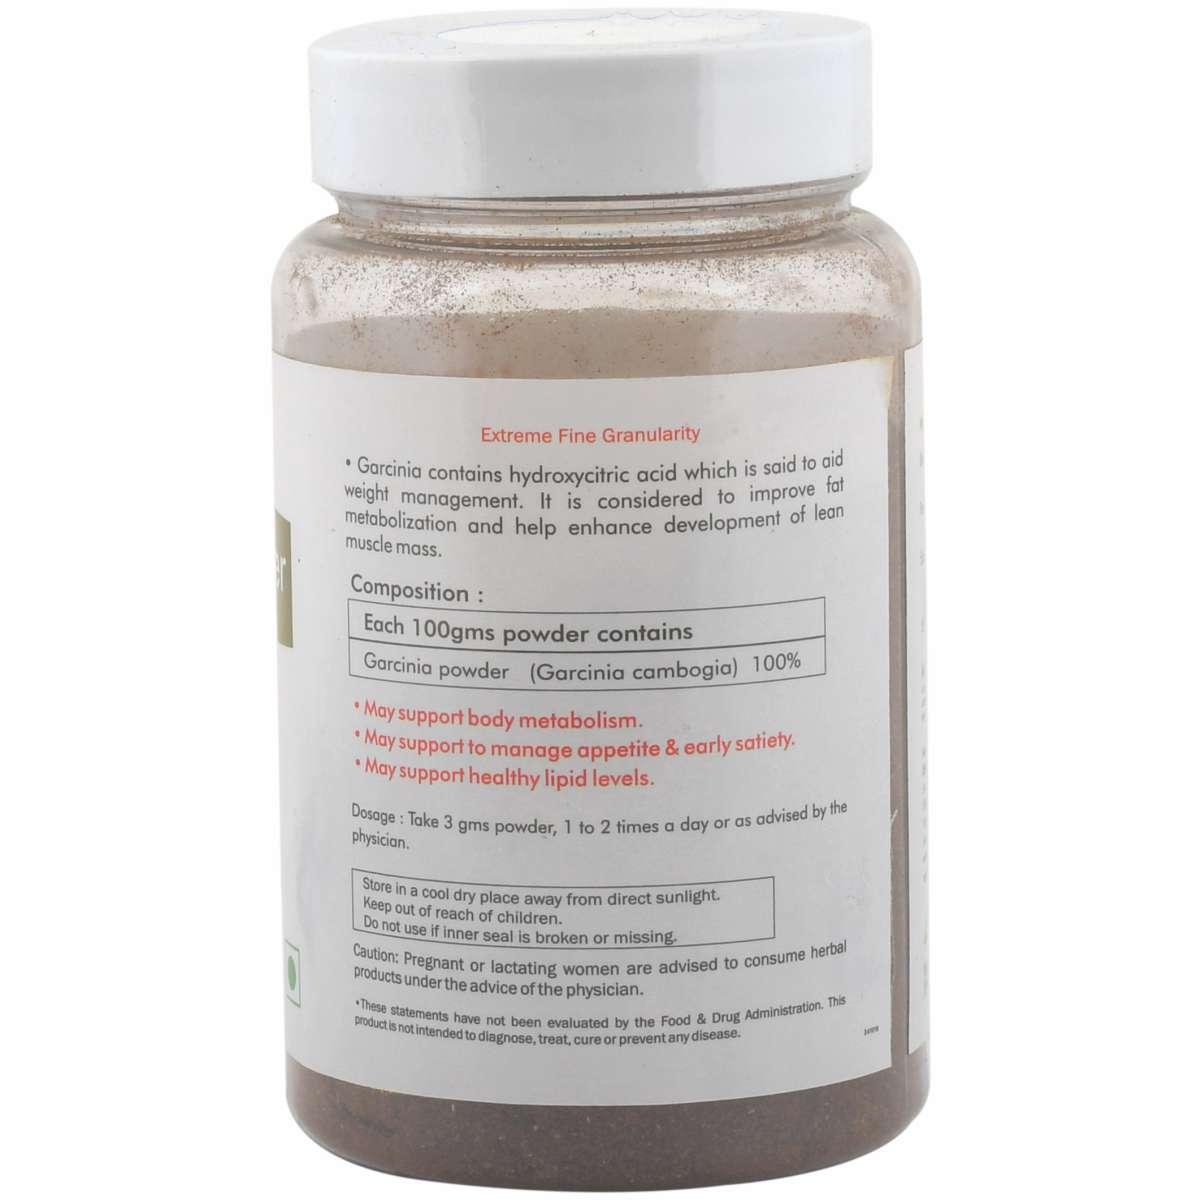 Ayurvedic Garcinia Powder 100gm for Weight Management (Pack of 2)